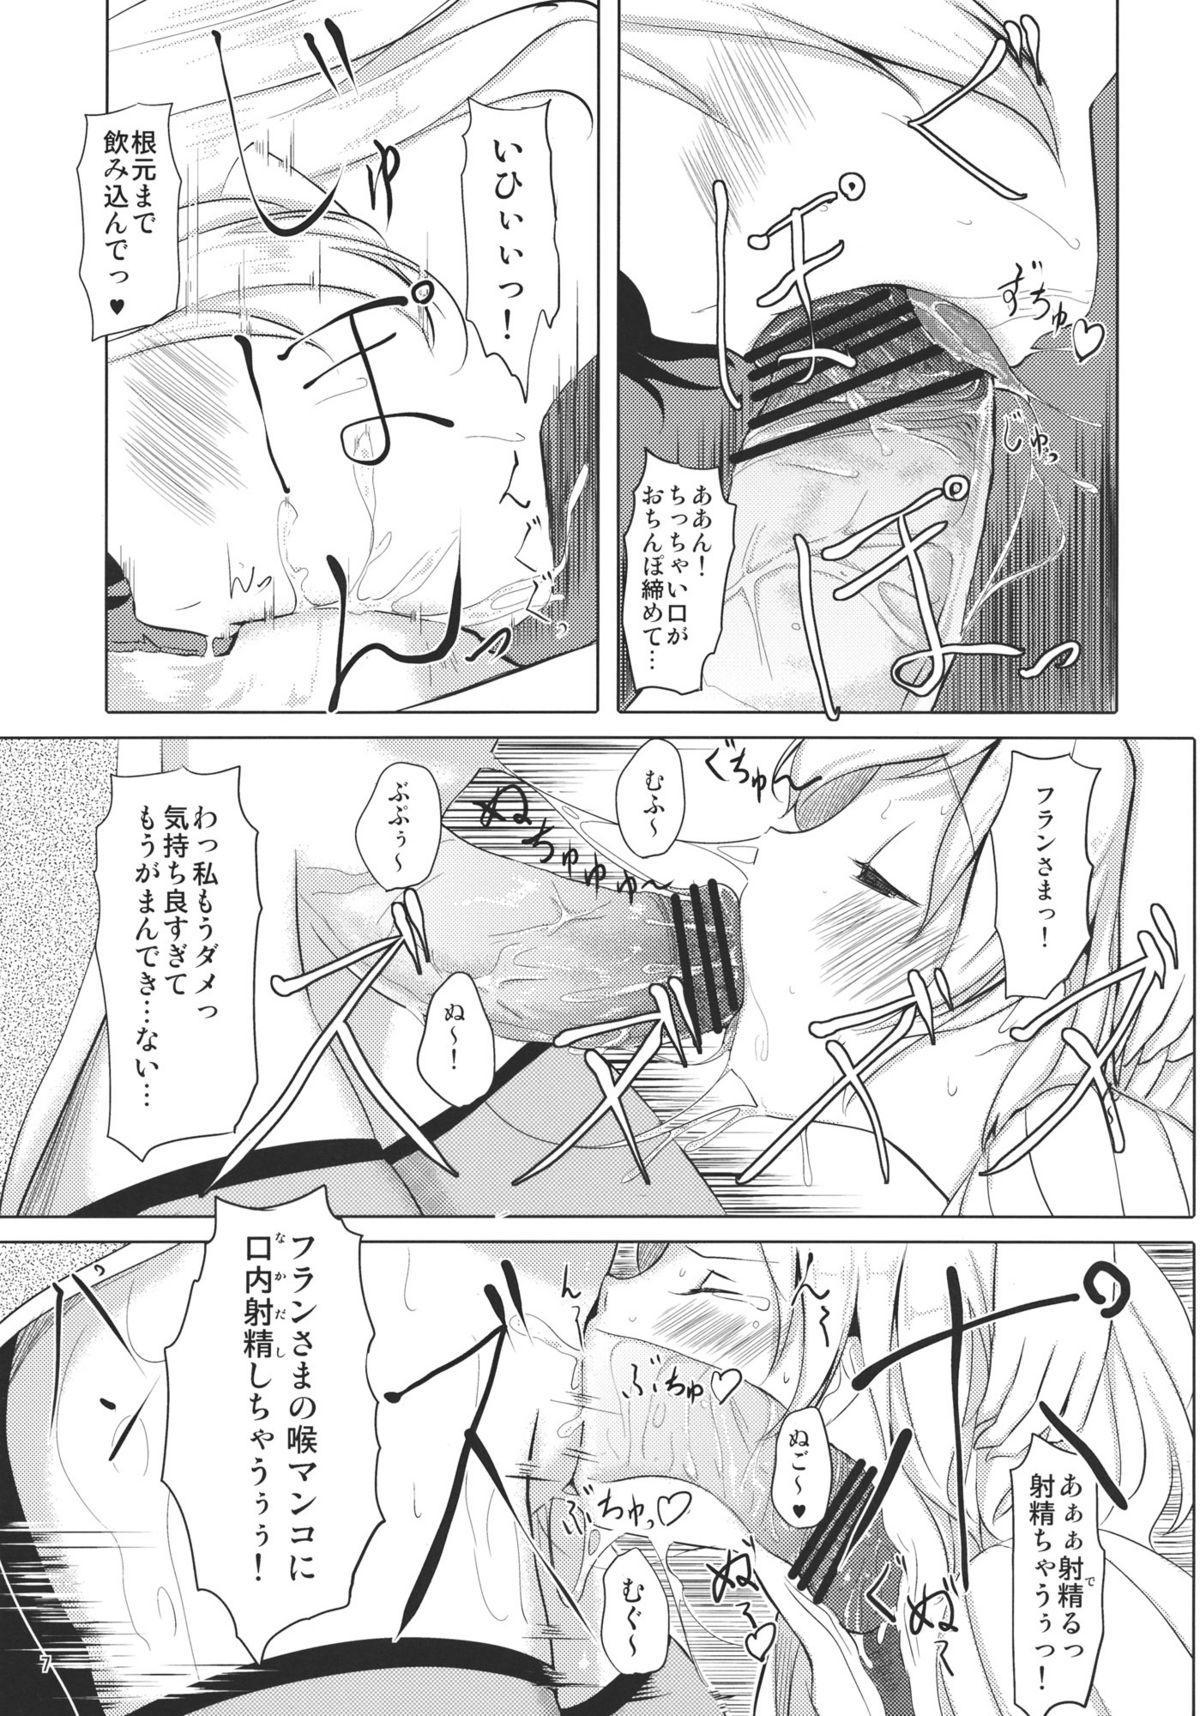 Flan-chan Infinity 8